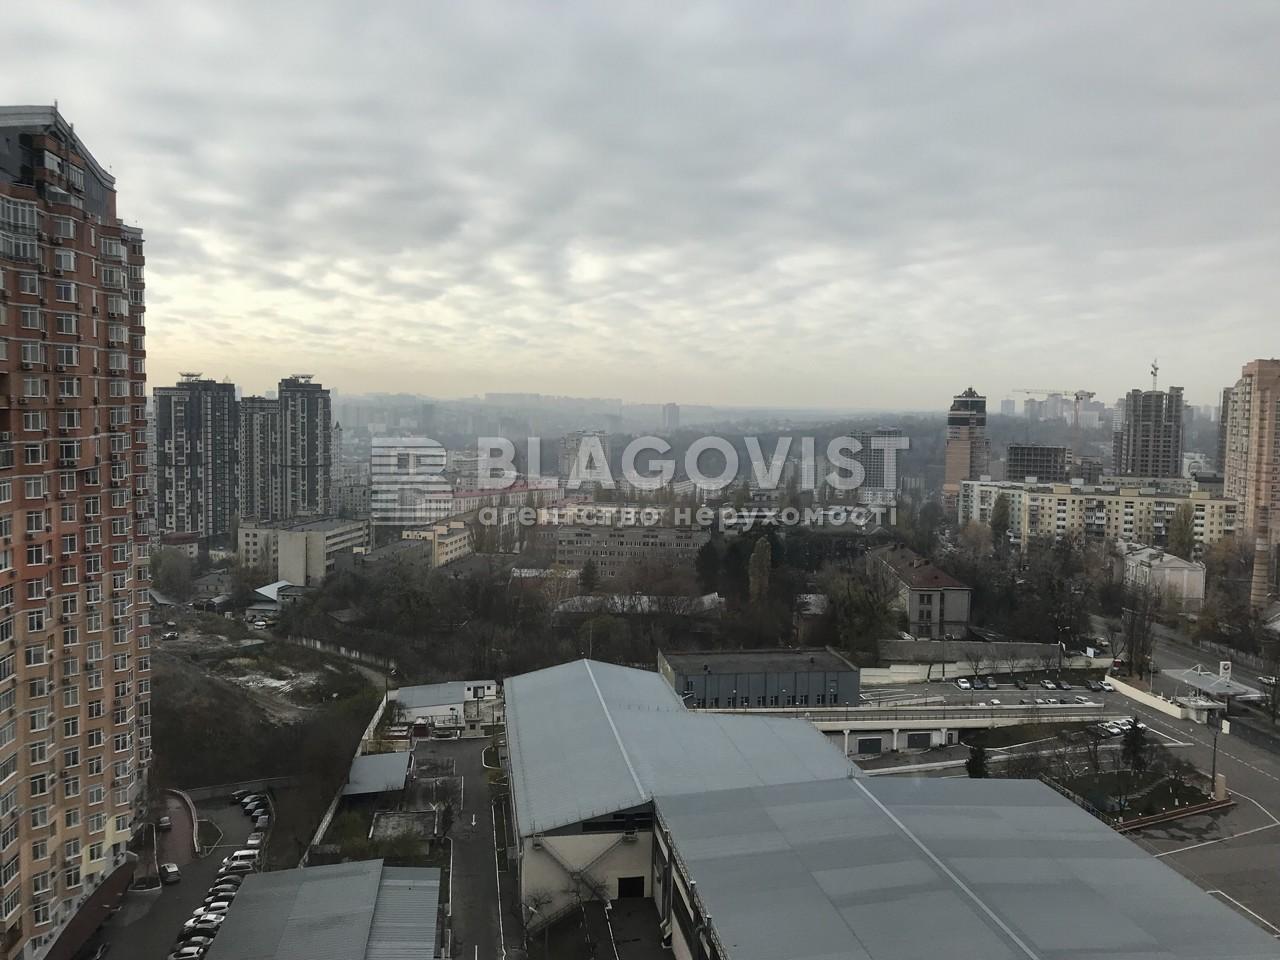 Квартира A-73479, Коновальца Евгения (Щорса), 32а, Киев - Фото 36